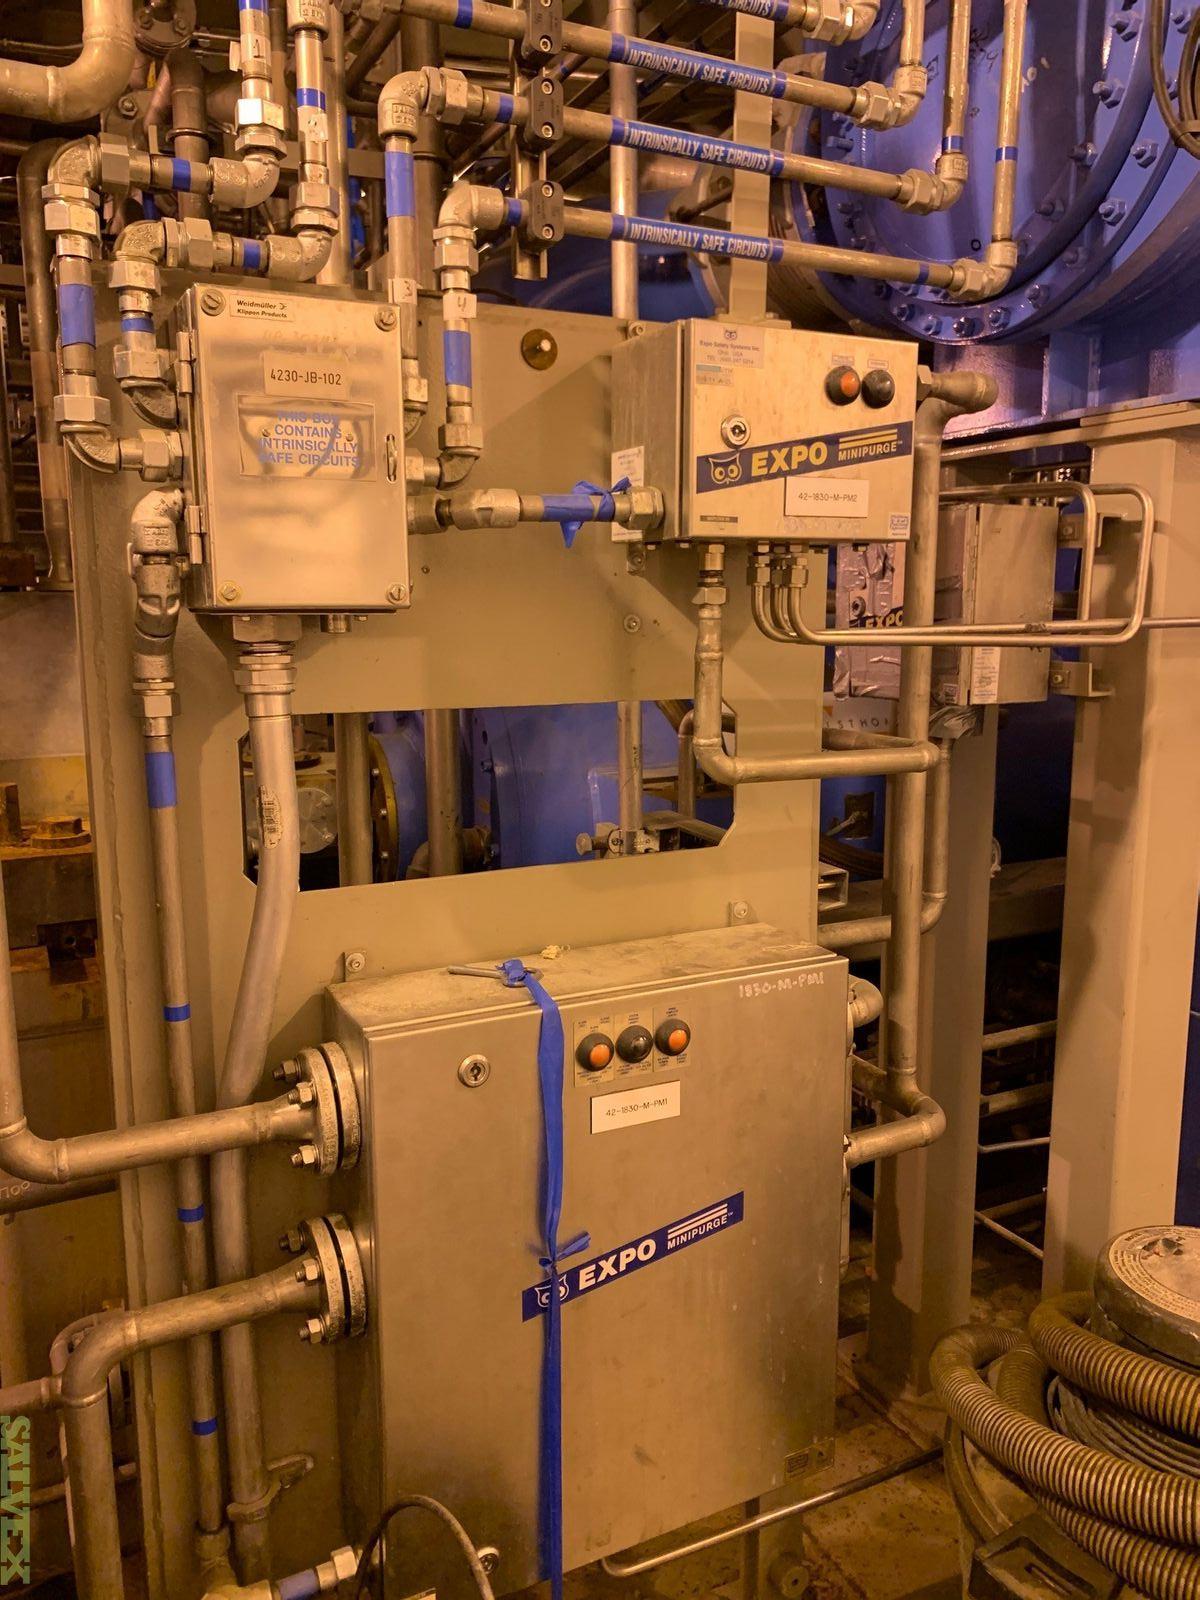 HOFIM Compressor (1 unit)